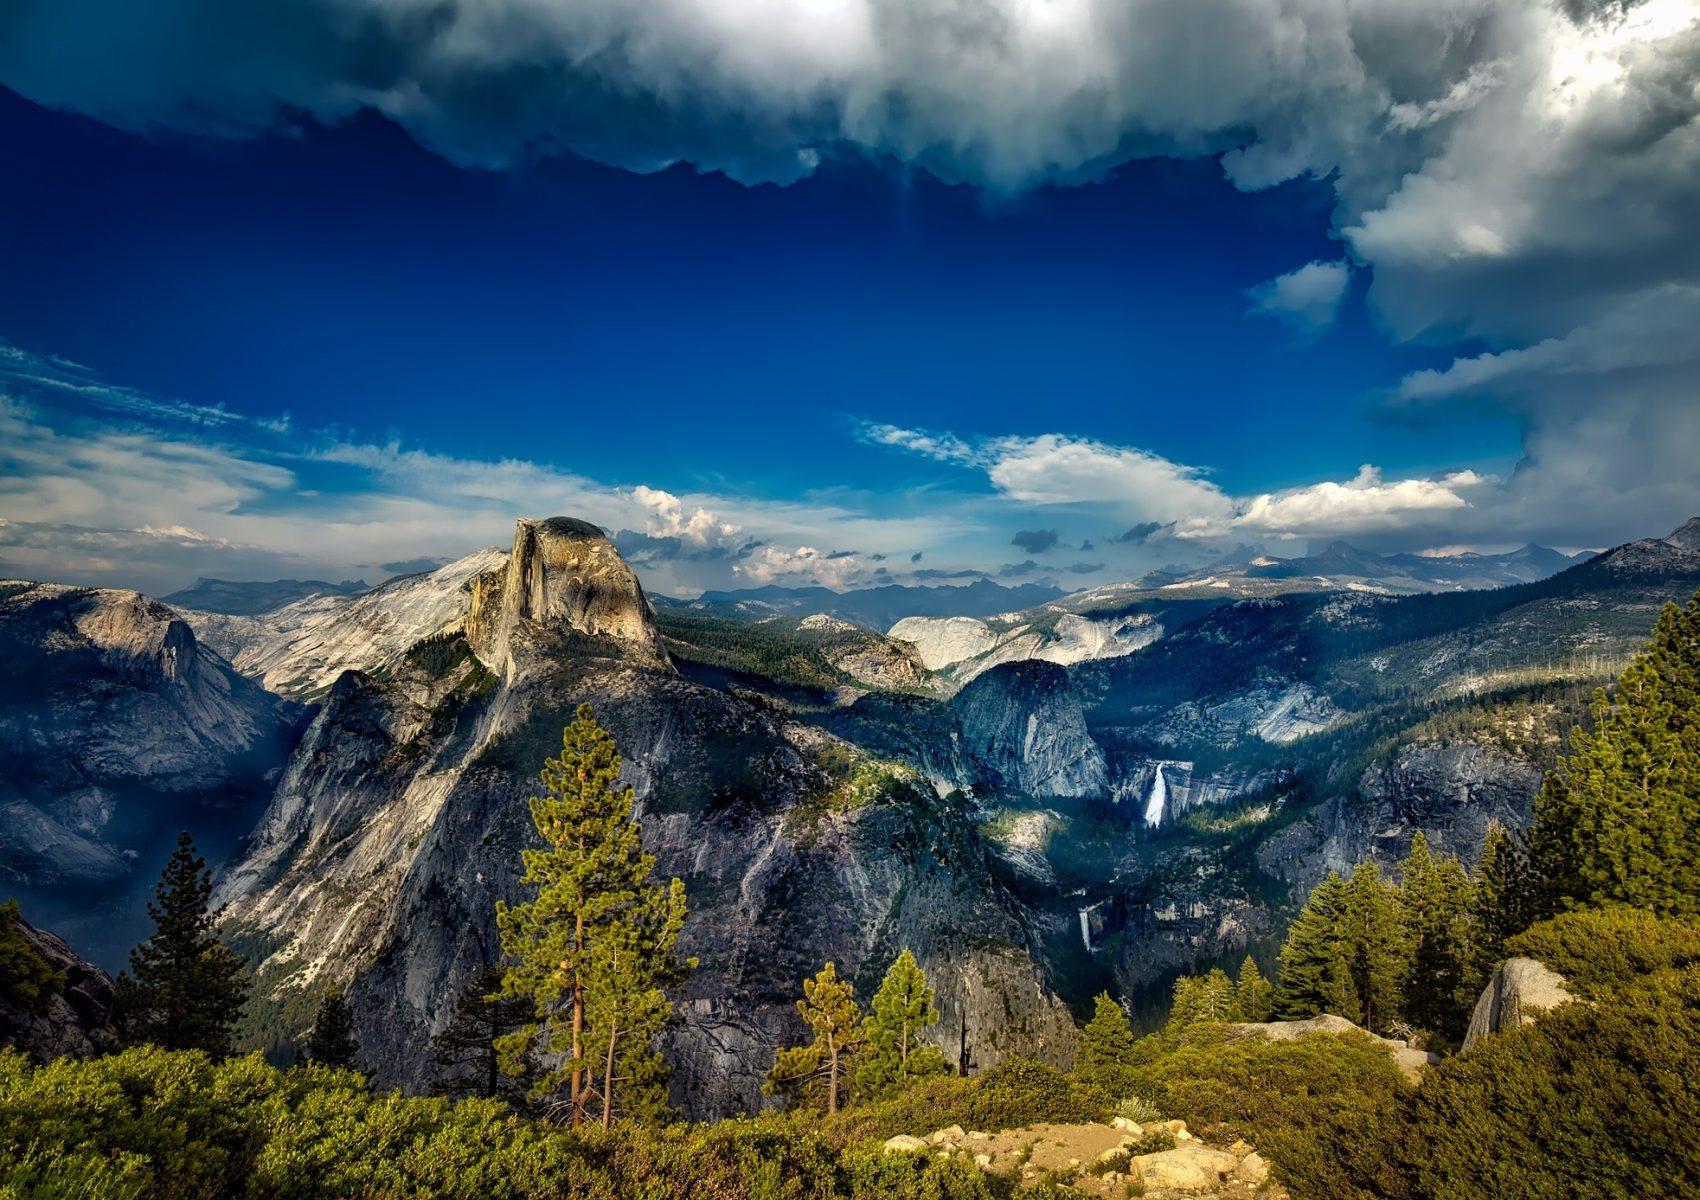 yosemite-national-park-landscape-california-144251